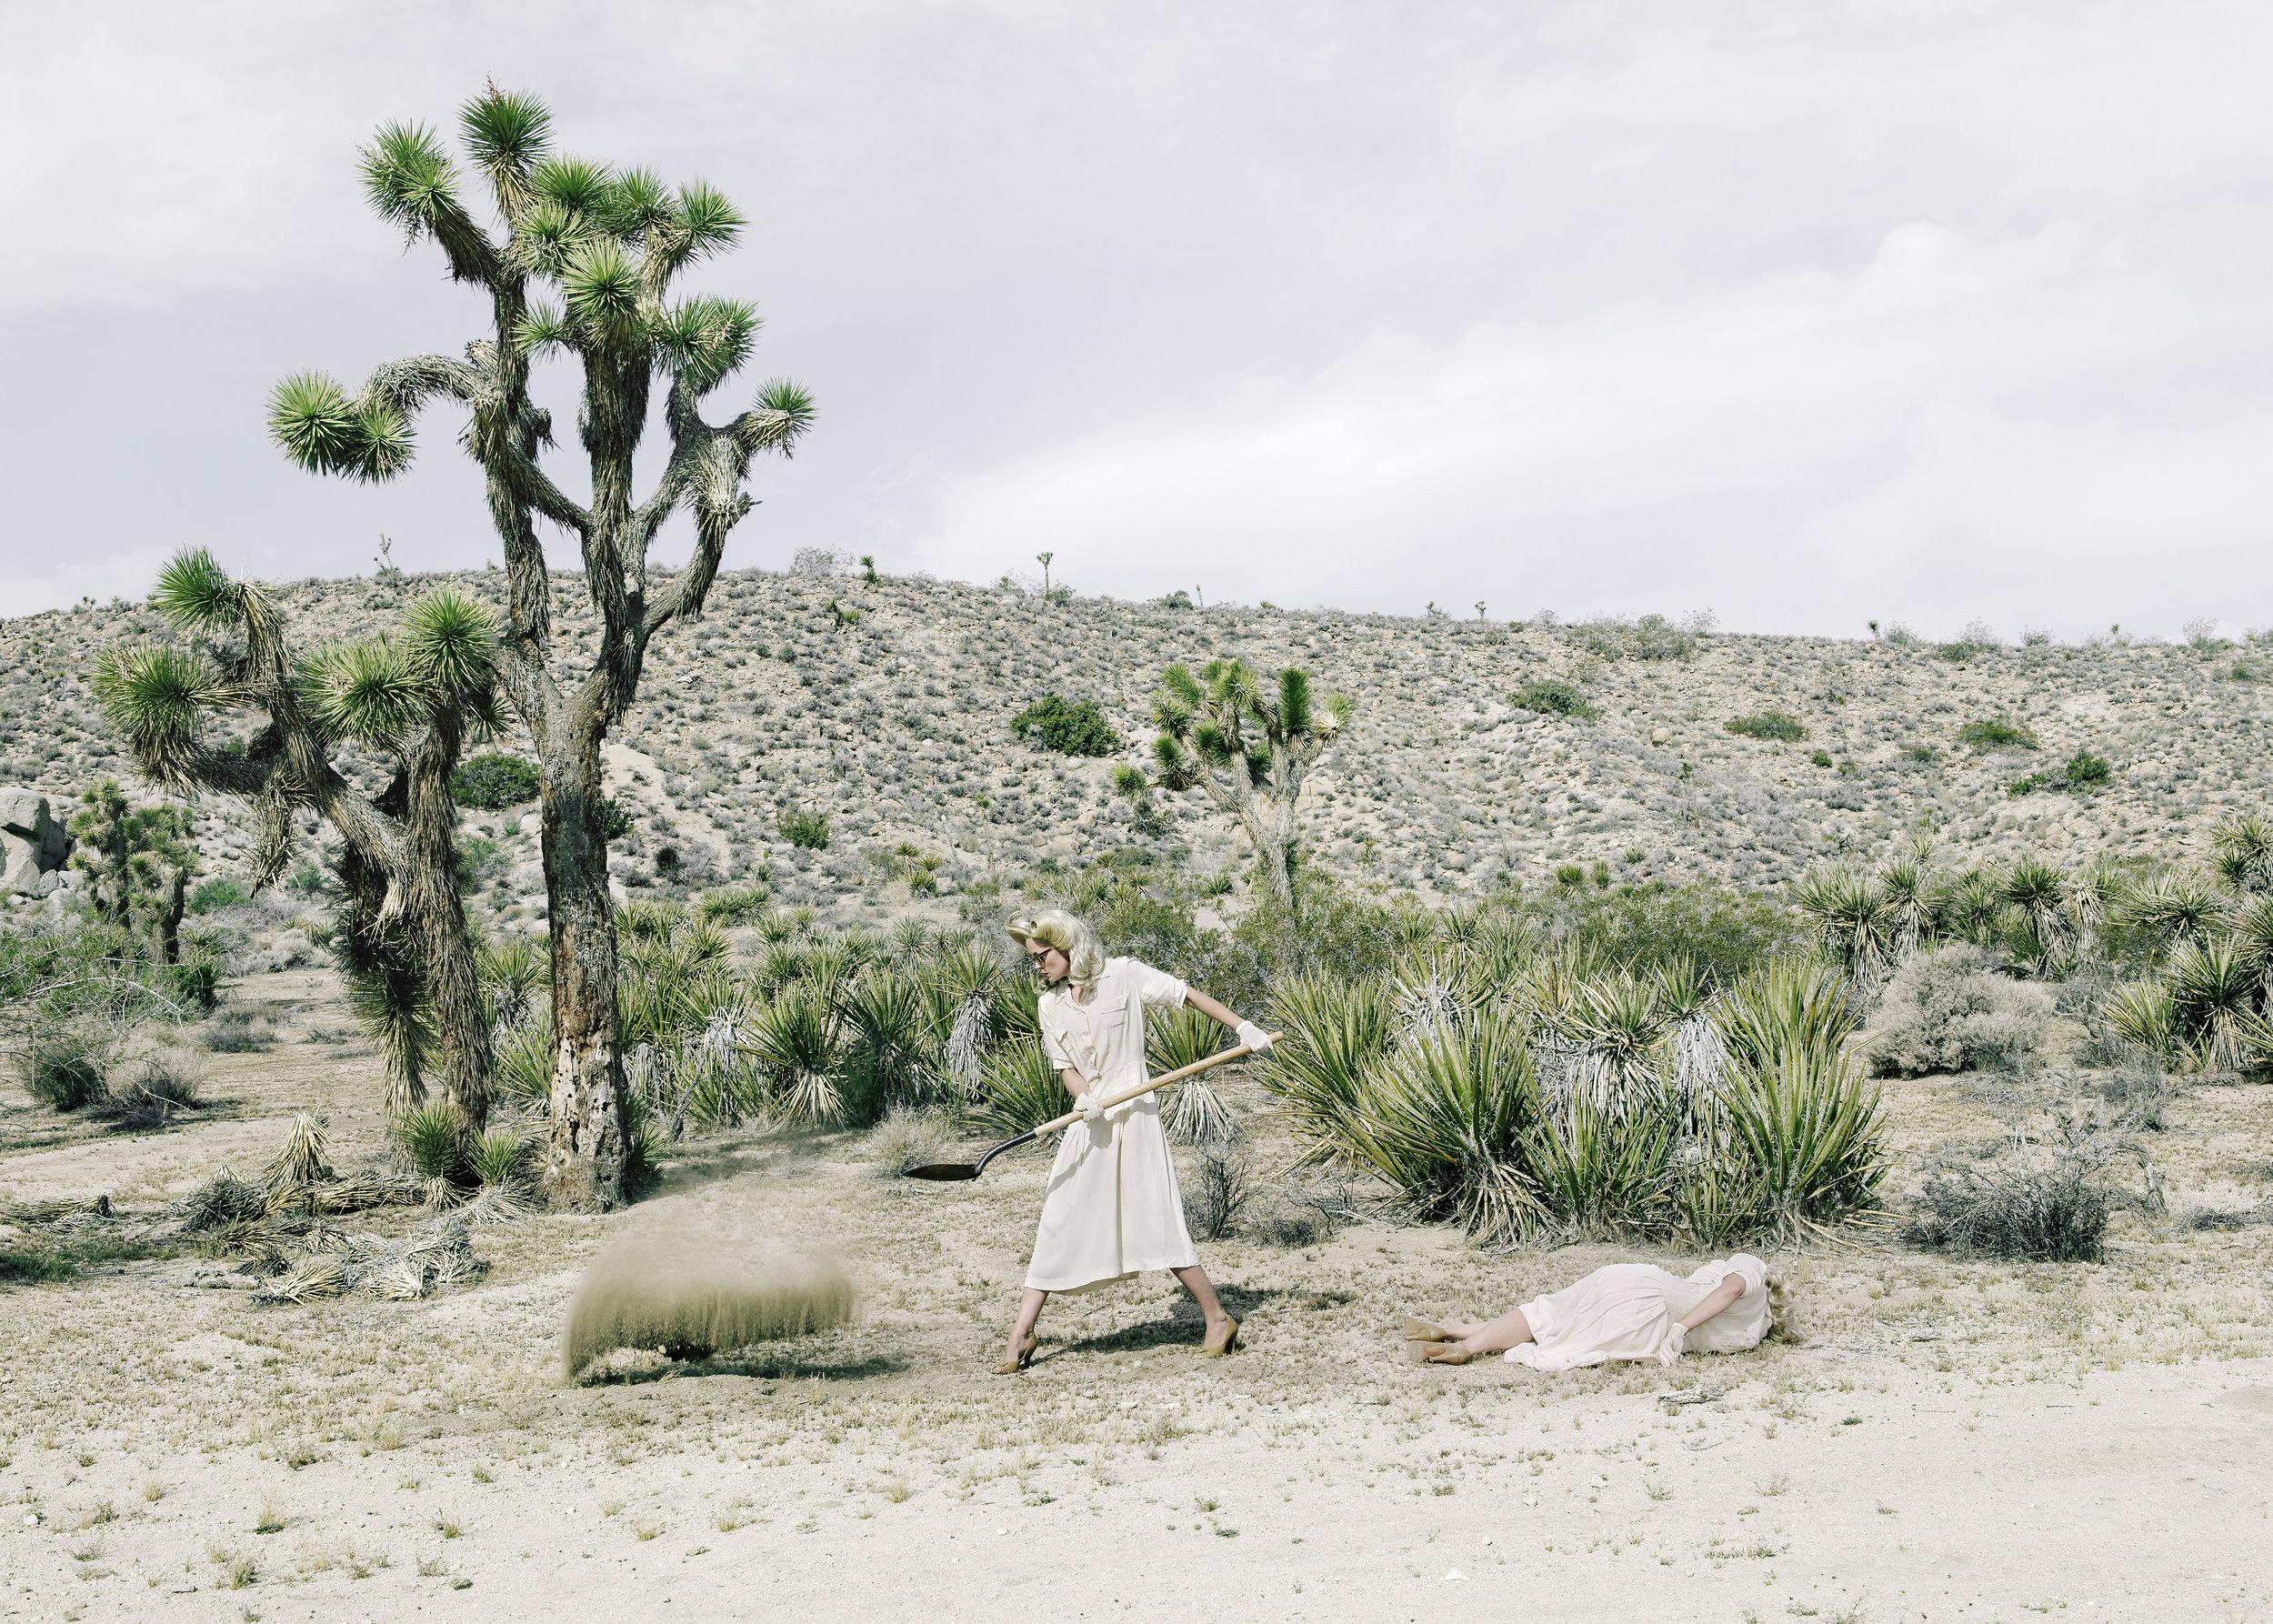 The Desert © Anja Niemi.jpg